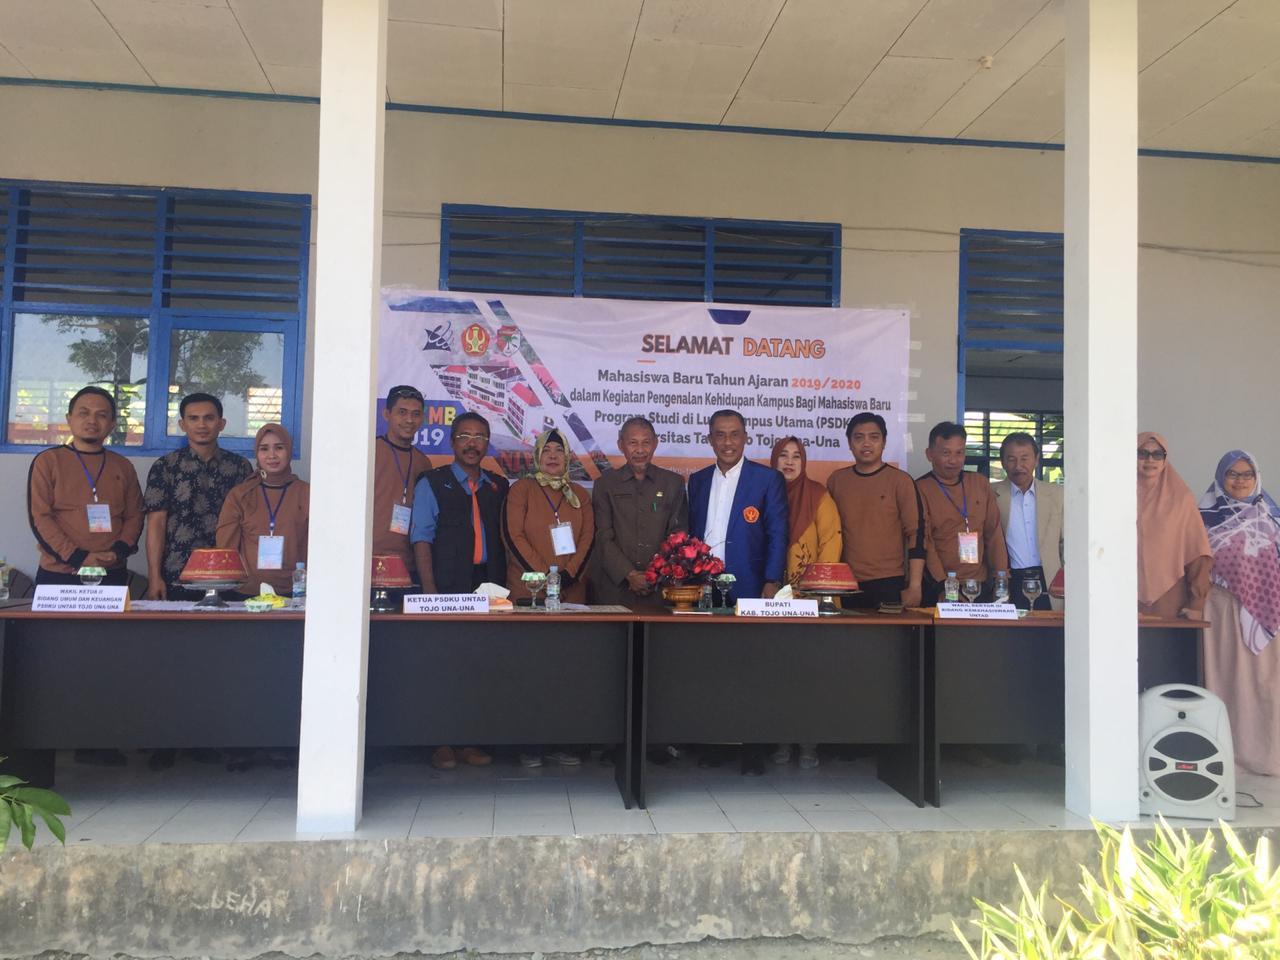 Kampus PSDKU Untad Tojo Una-Una Gelar Pengenalan Kehidupan Kampus Bagi Mahasiswa Baru (PKKMB) Angkatan 2019